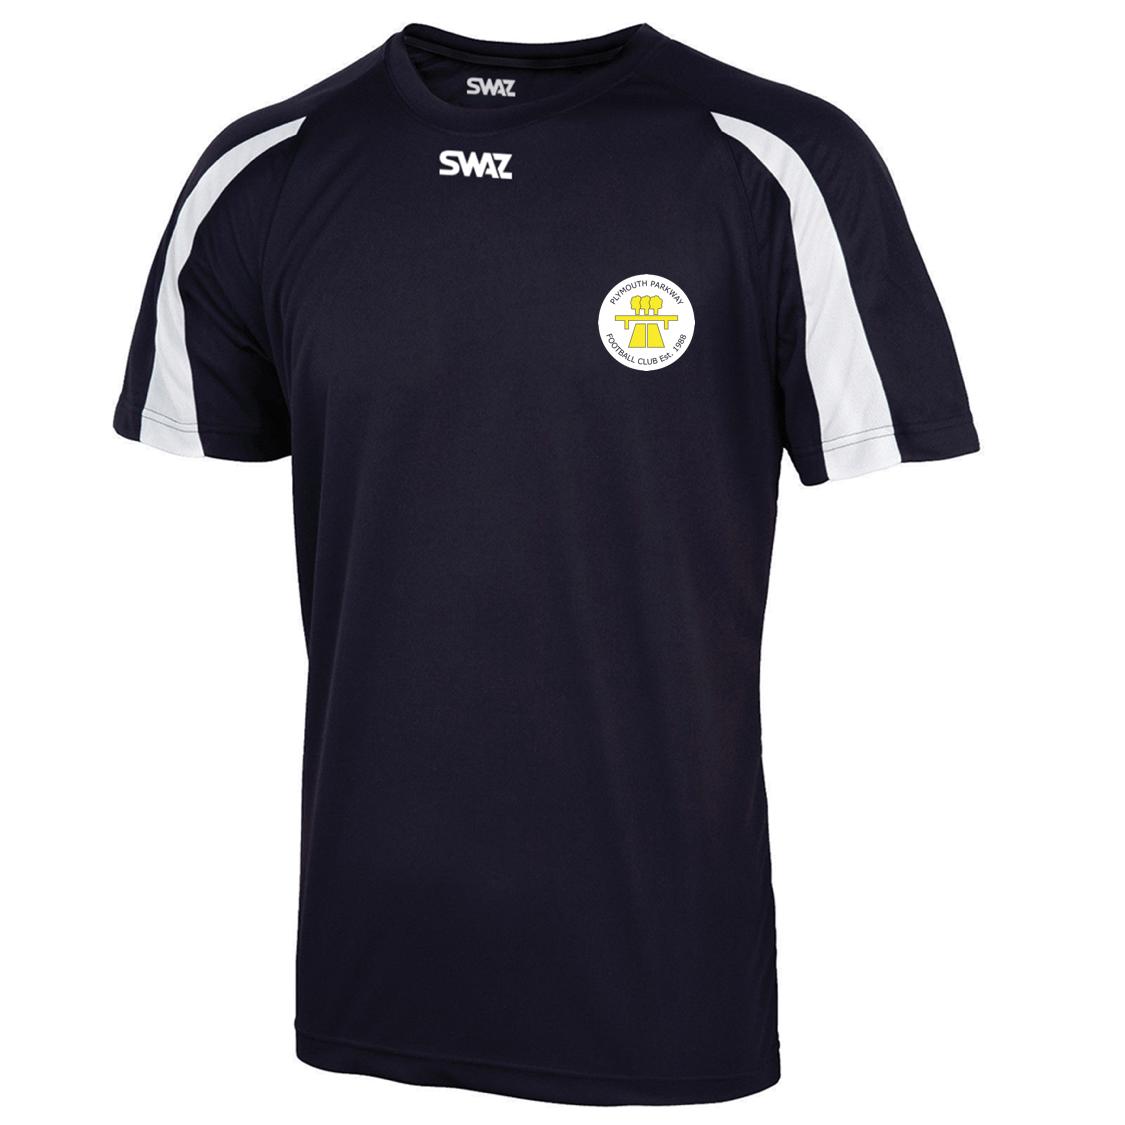 Plymouth Parkway Premier Training T-Shirt | SWAZ Teamwear |